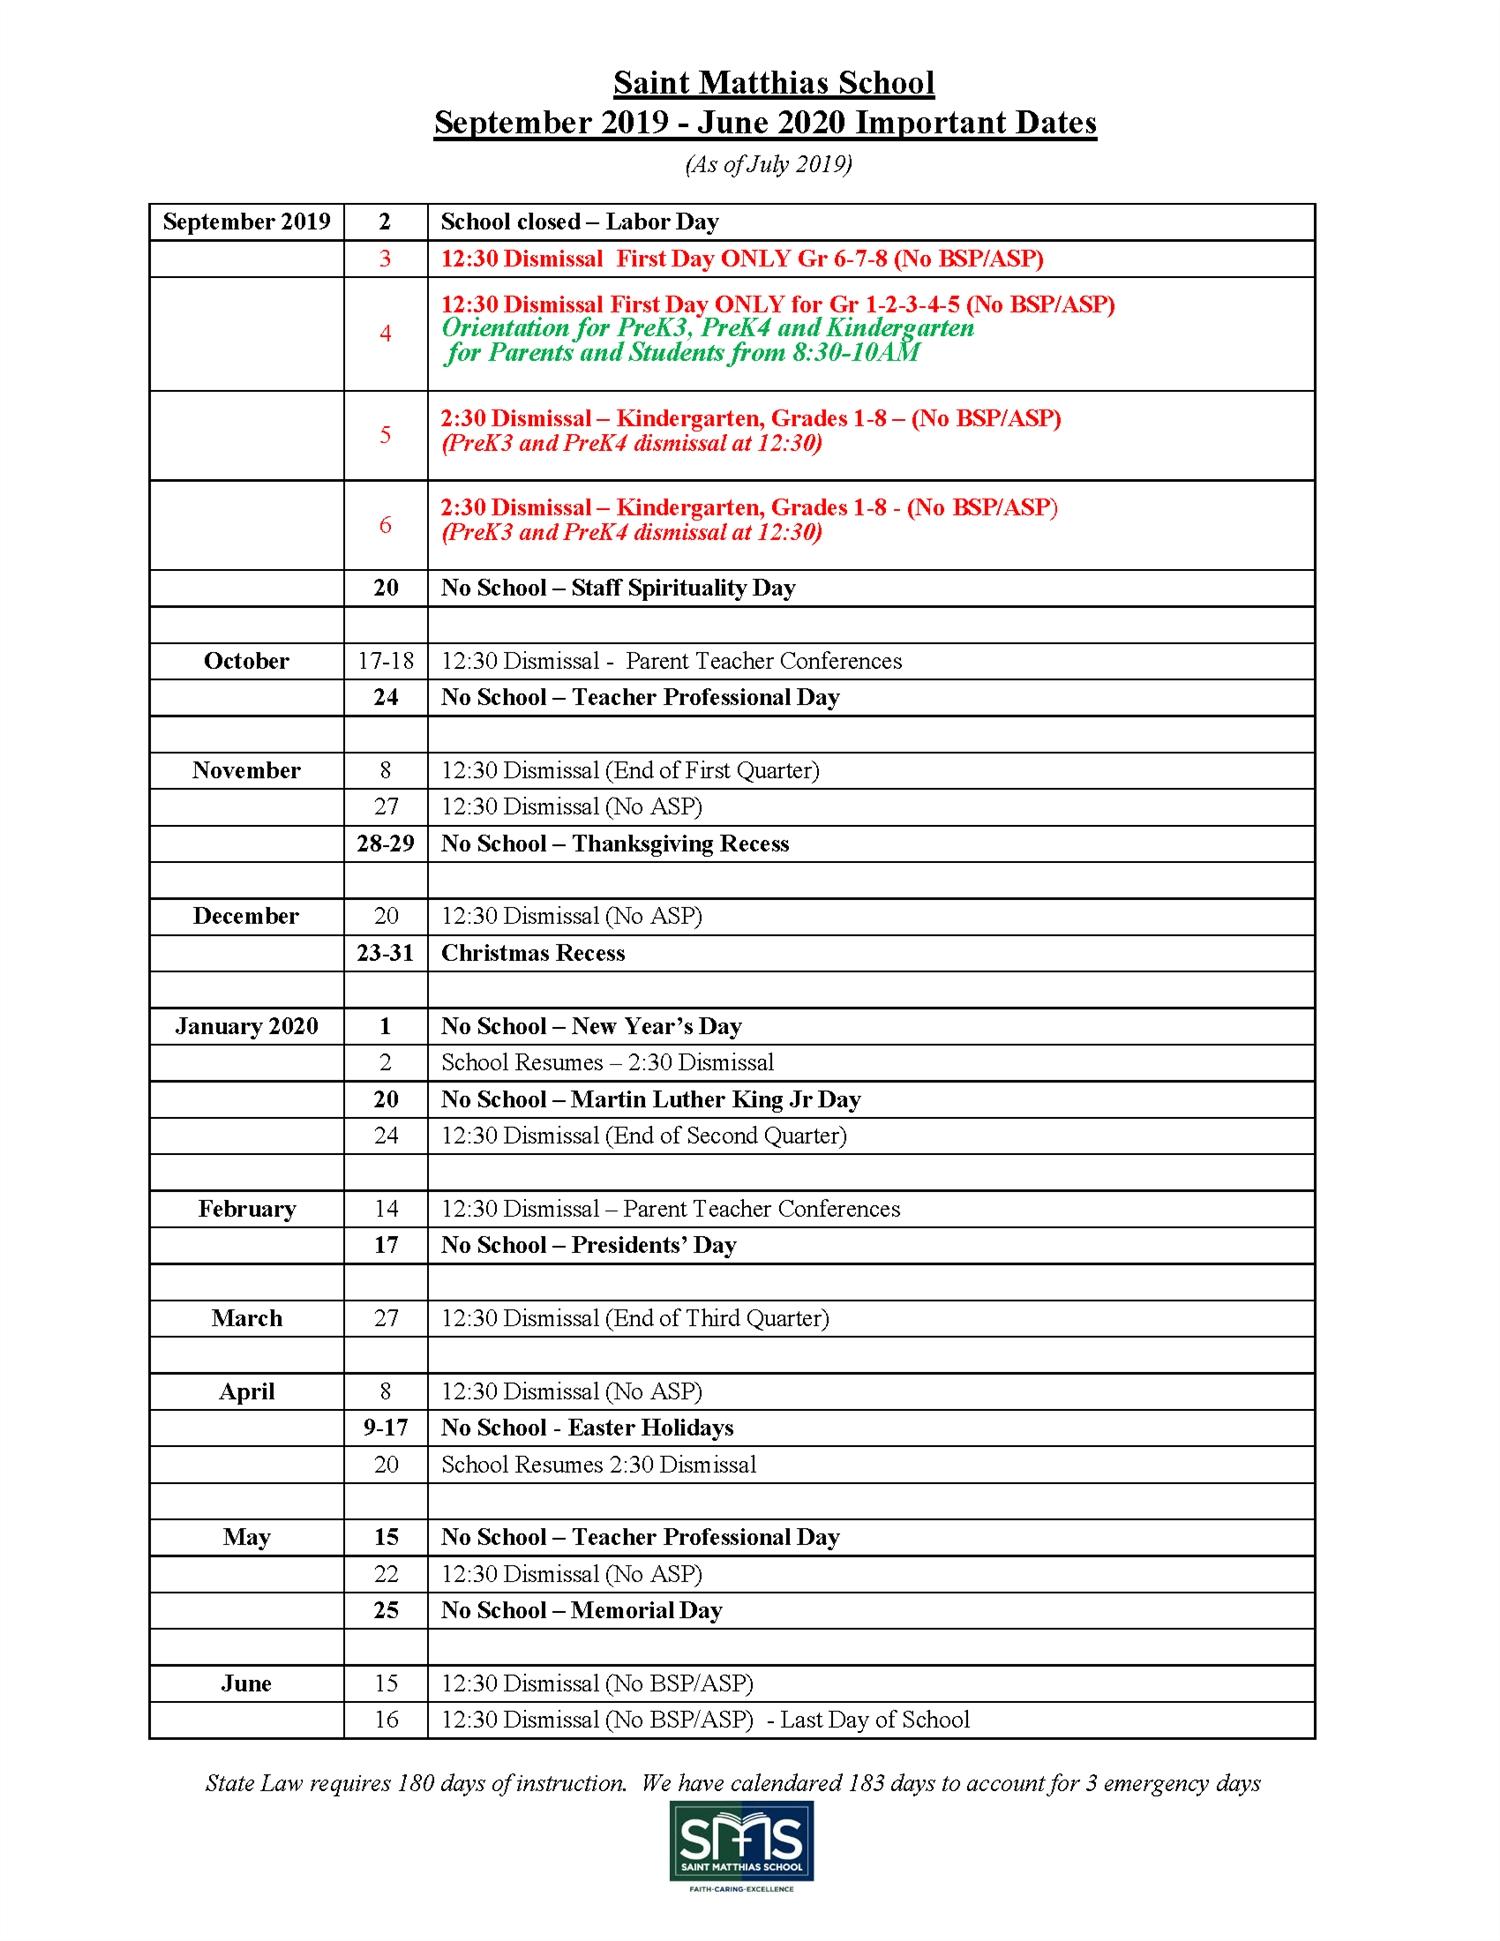 Calendar 2020 Important Dates | Calendar Printables Free intended for 2020 Calendar With Important Dates